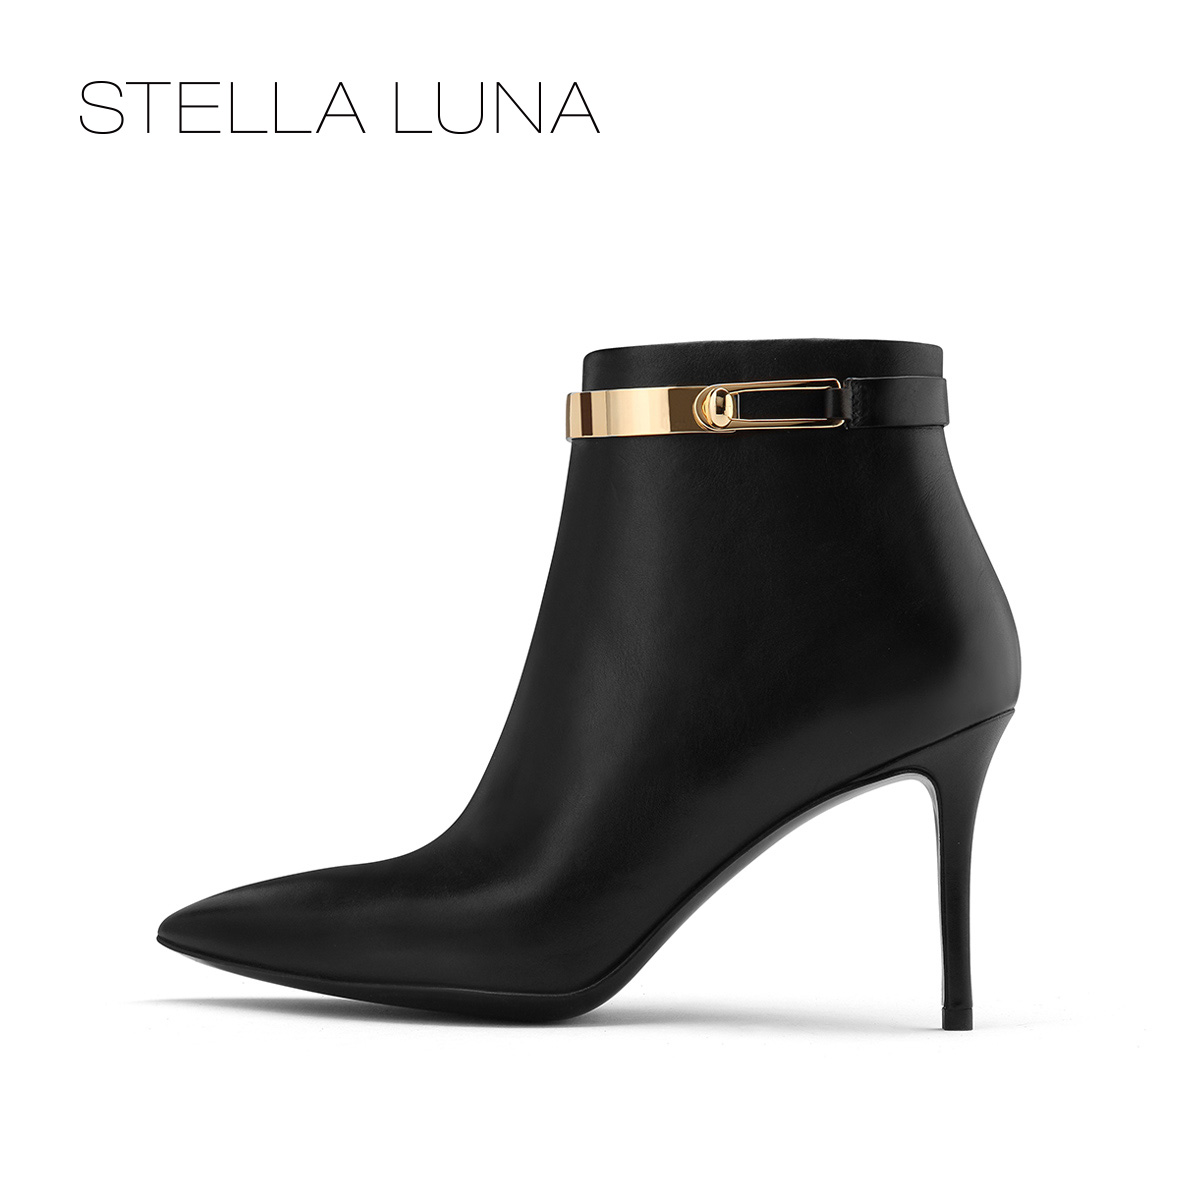 STELLA LUNA冬季新款金属搭扣细高跟女士短靴SG320C01064